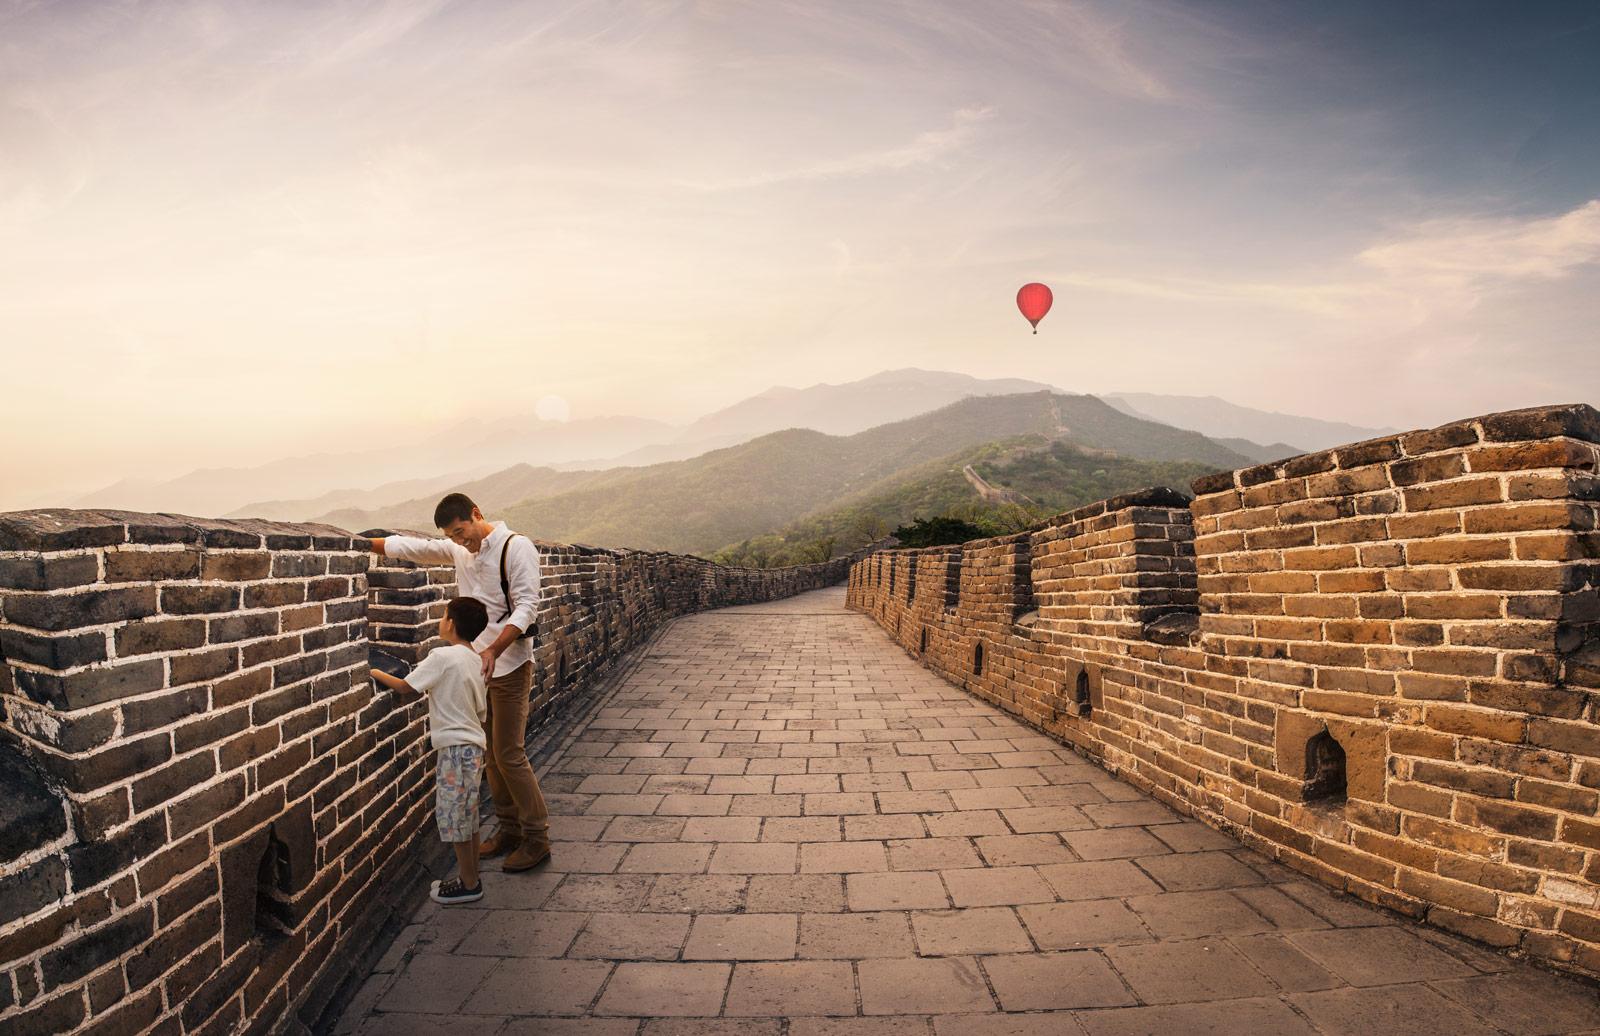 China_GreatWall_v1v2.jpg